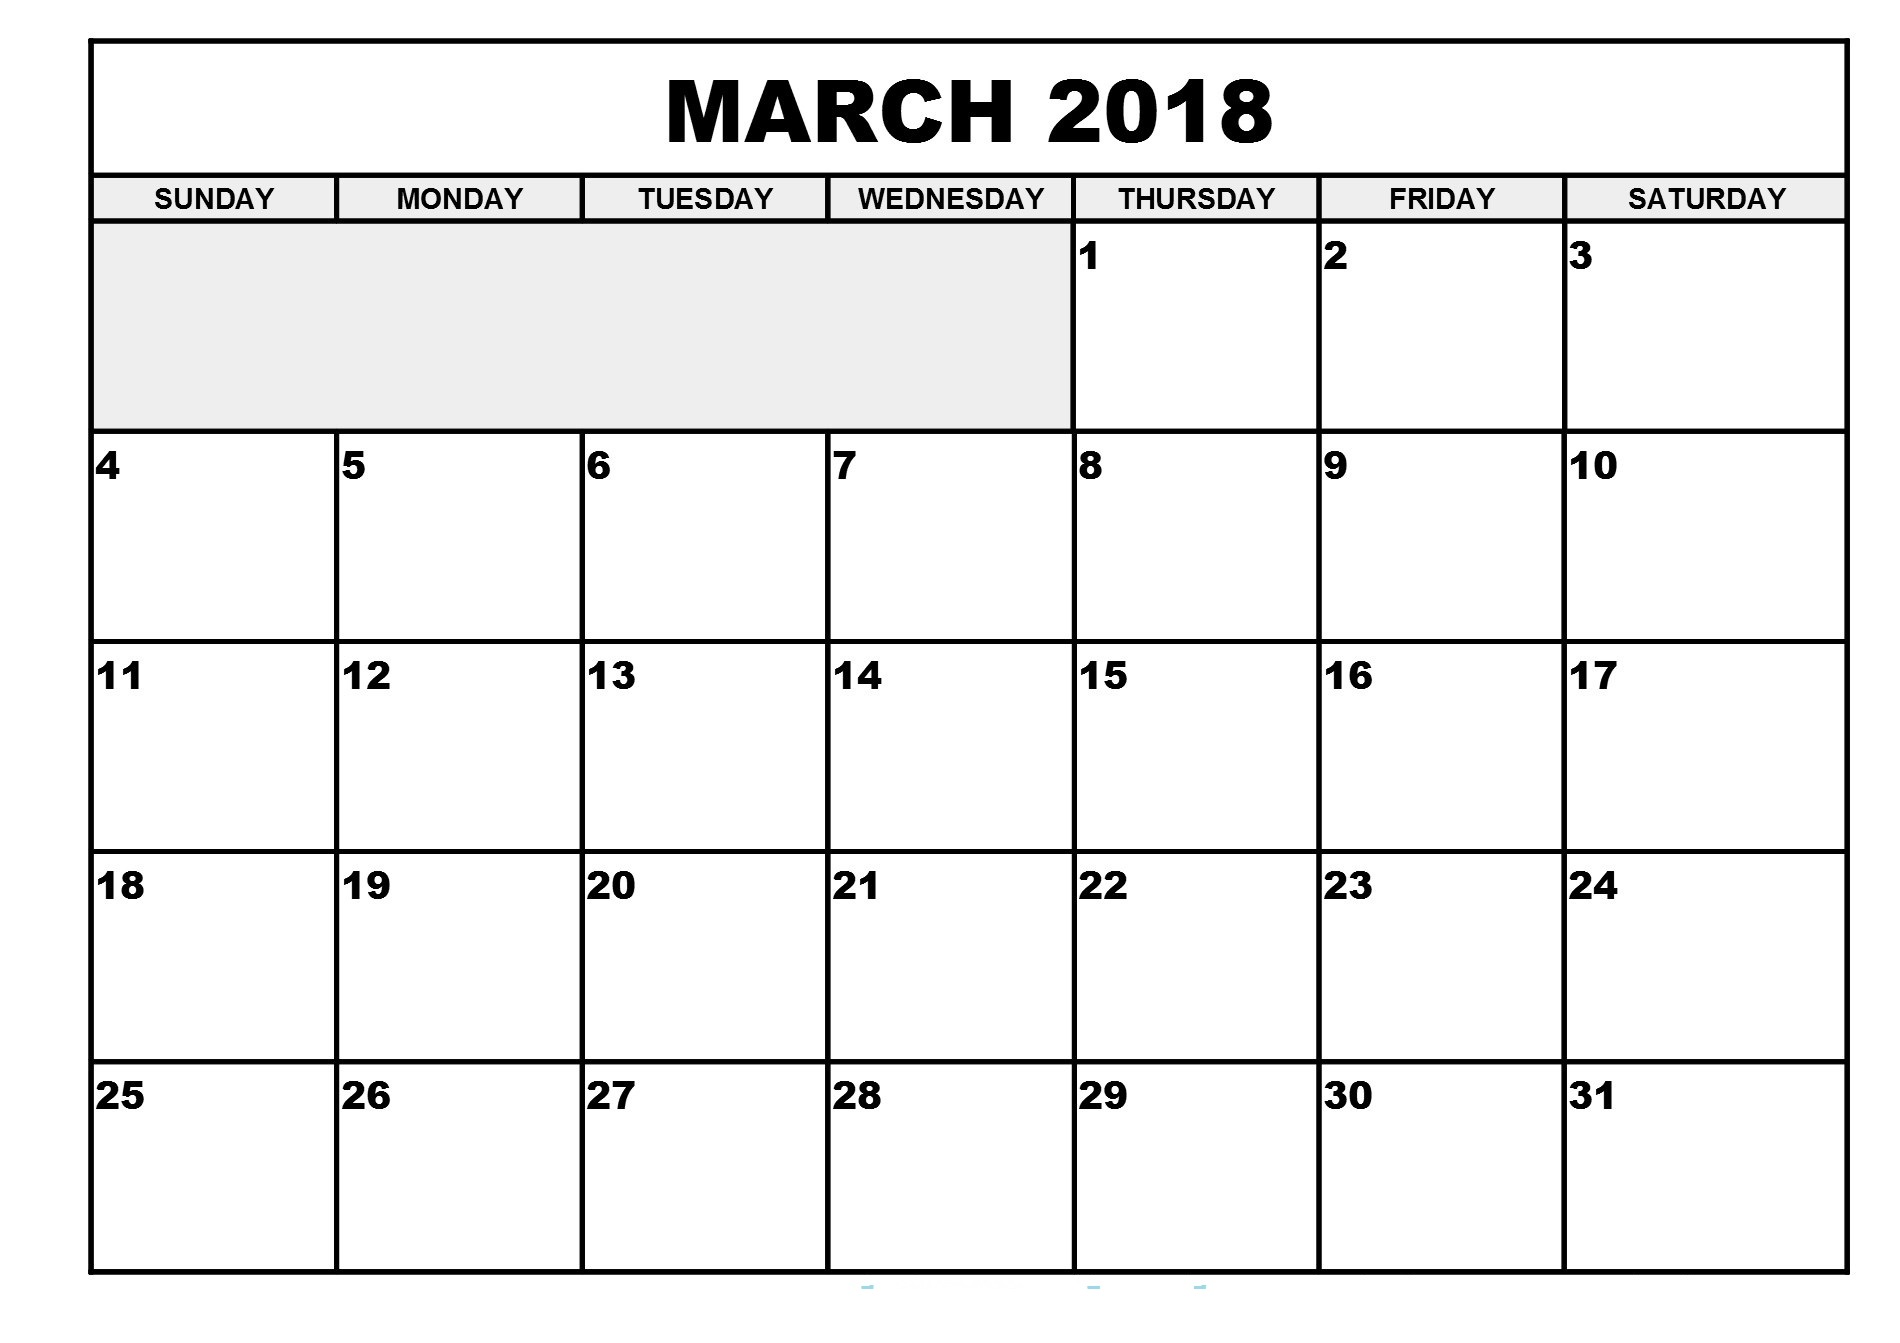 Free March 2018 printable calendar download